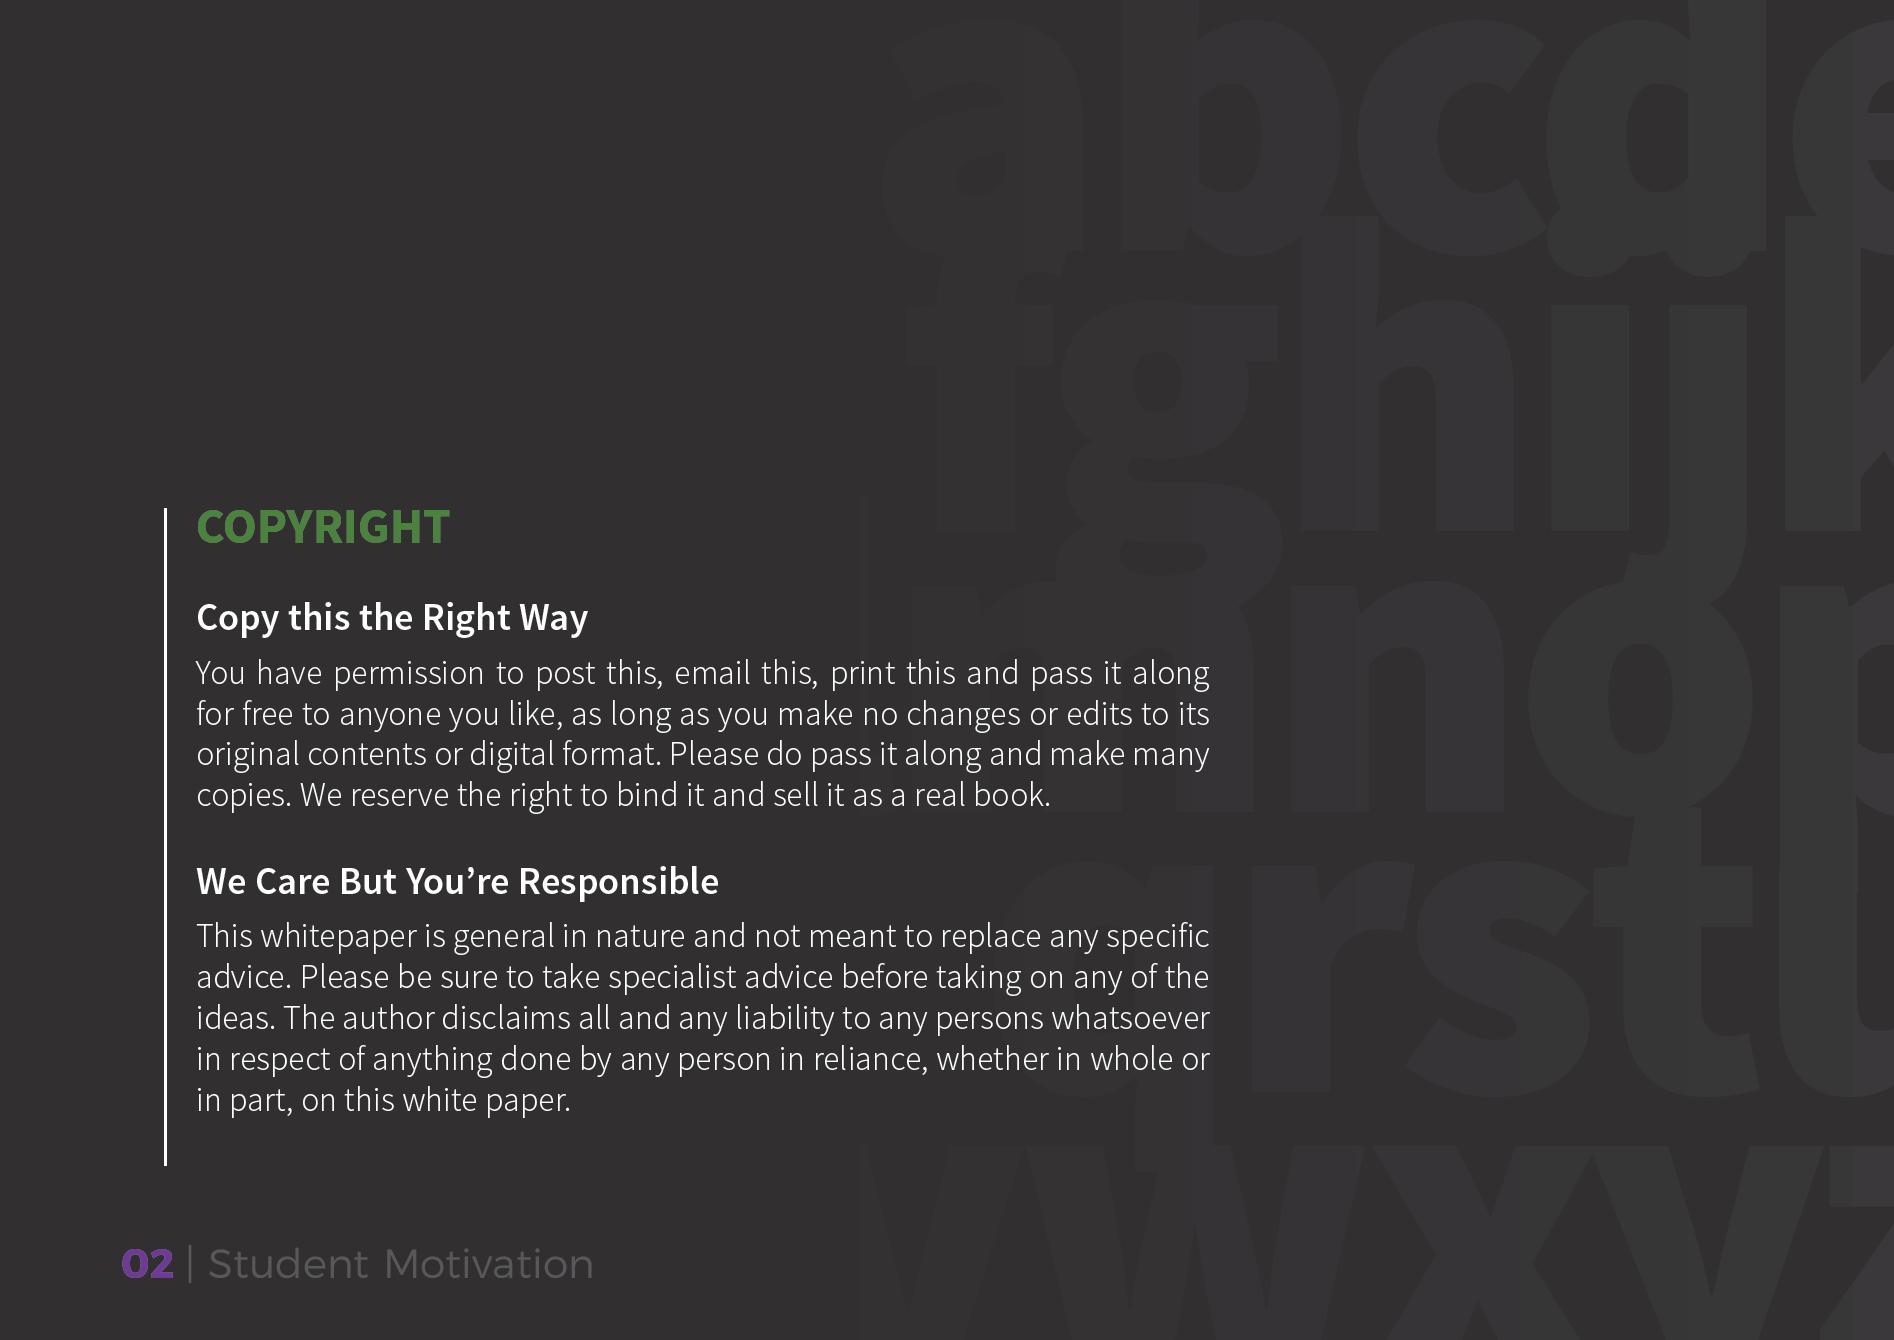 Student Motivation - copyright.PNG